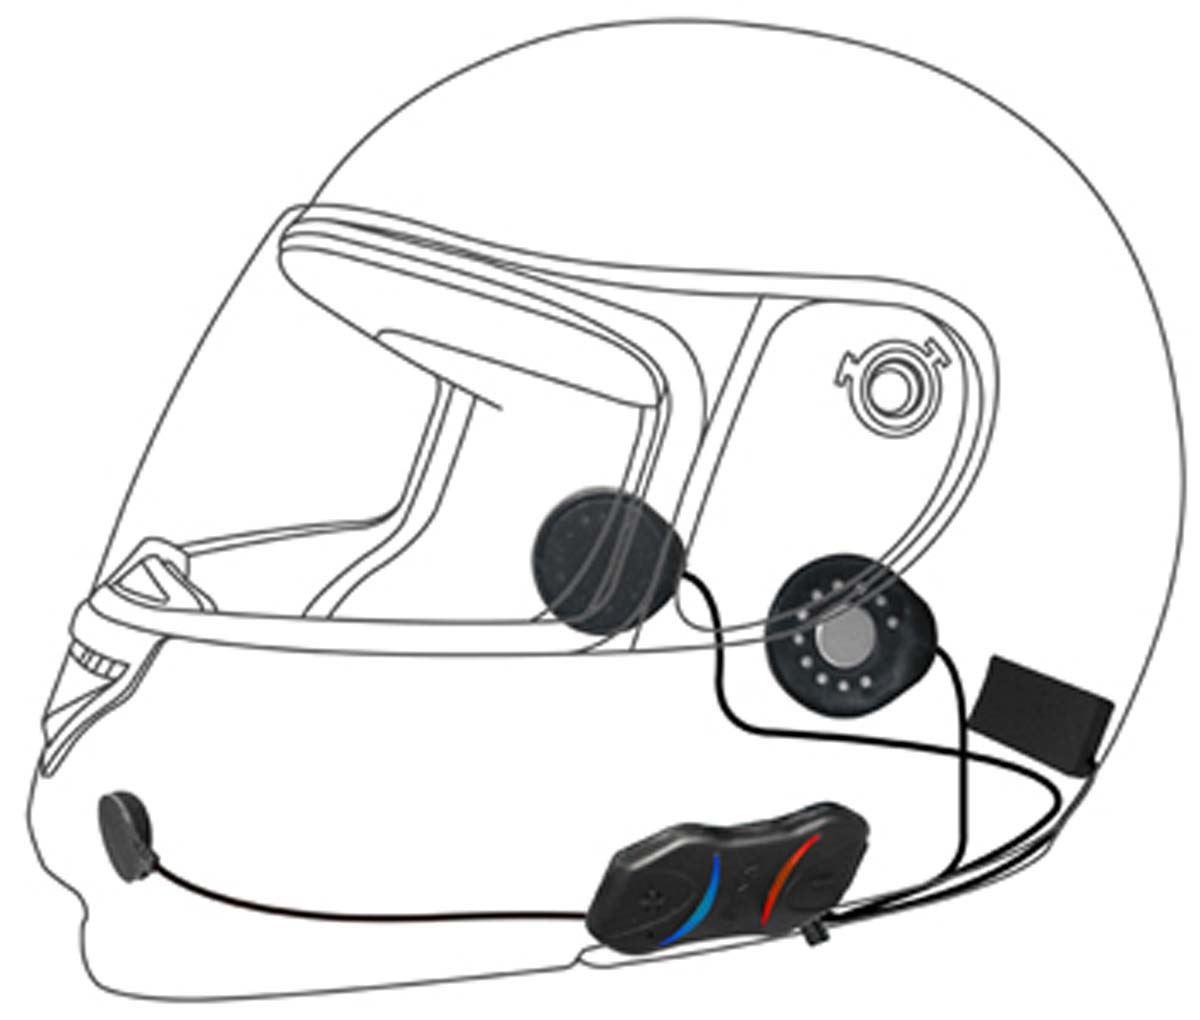 sena smh10r low profile motorcycle bluetooth headset and intercom. Black Bedroom Furniture Sets. Home Design Ideas